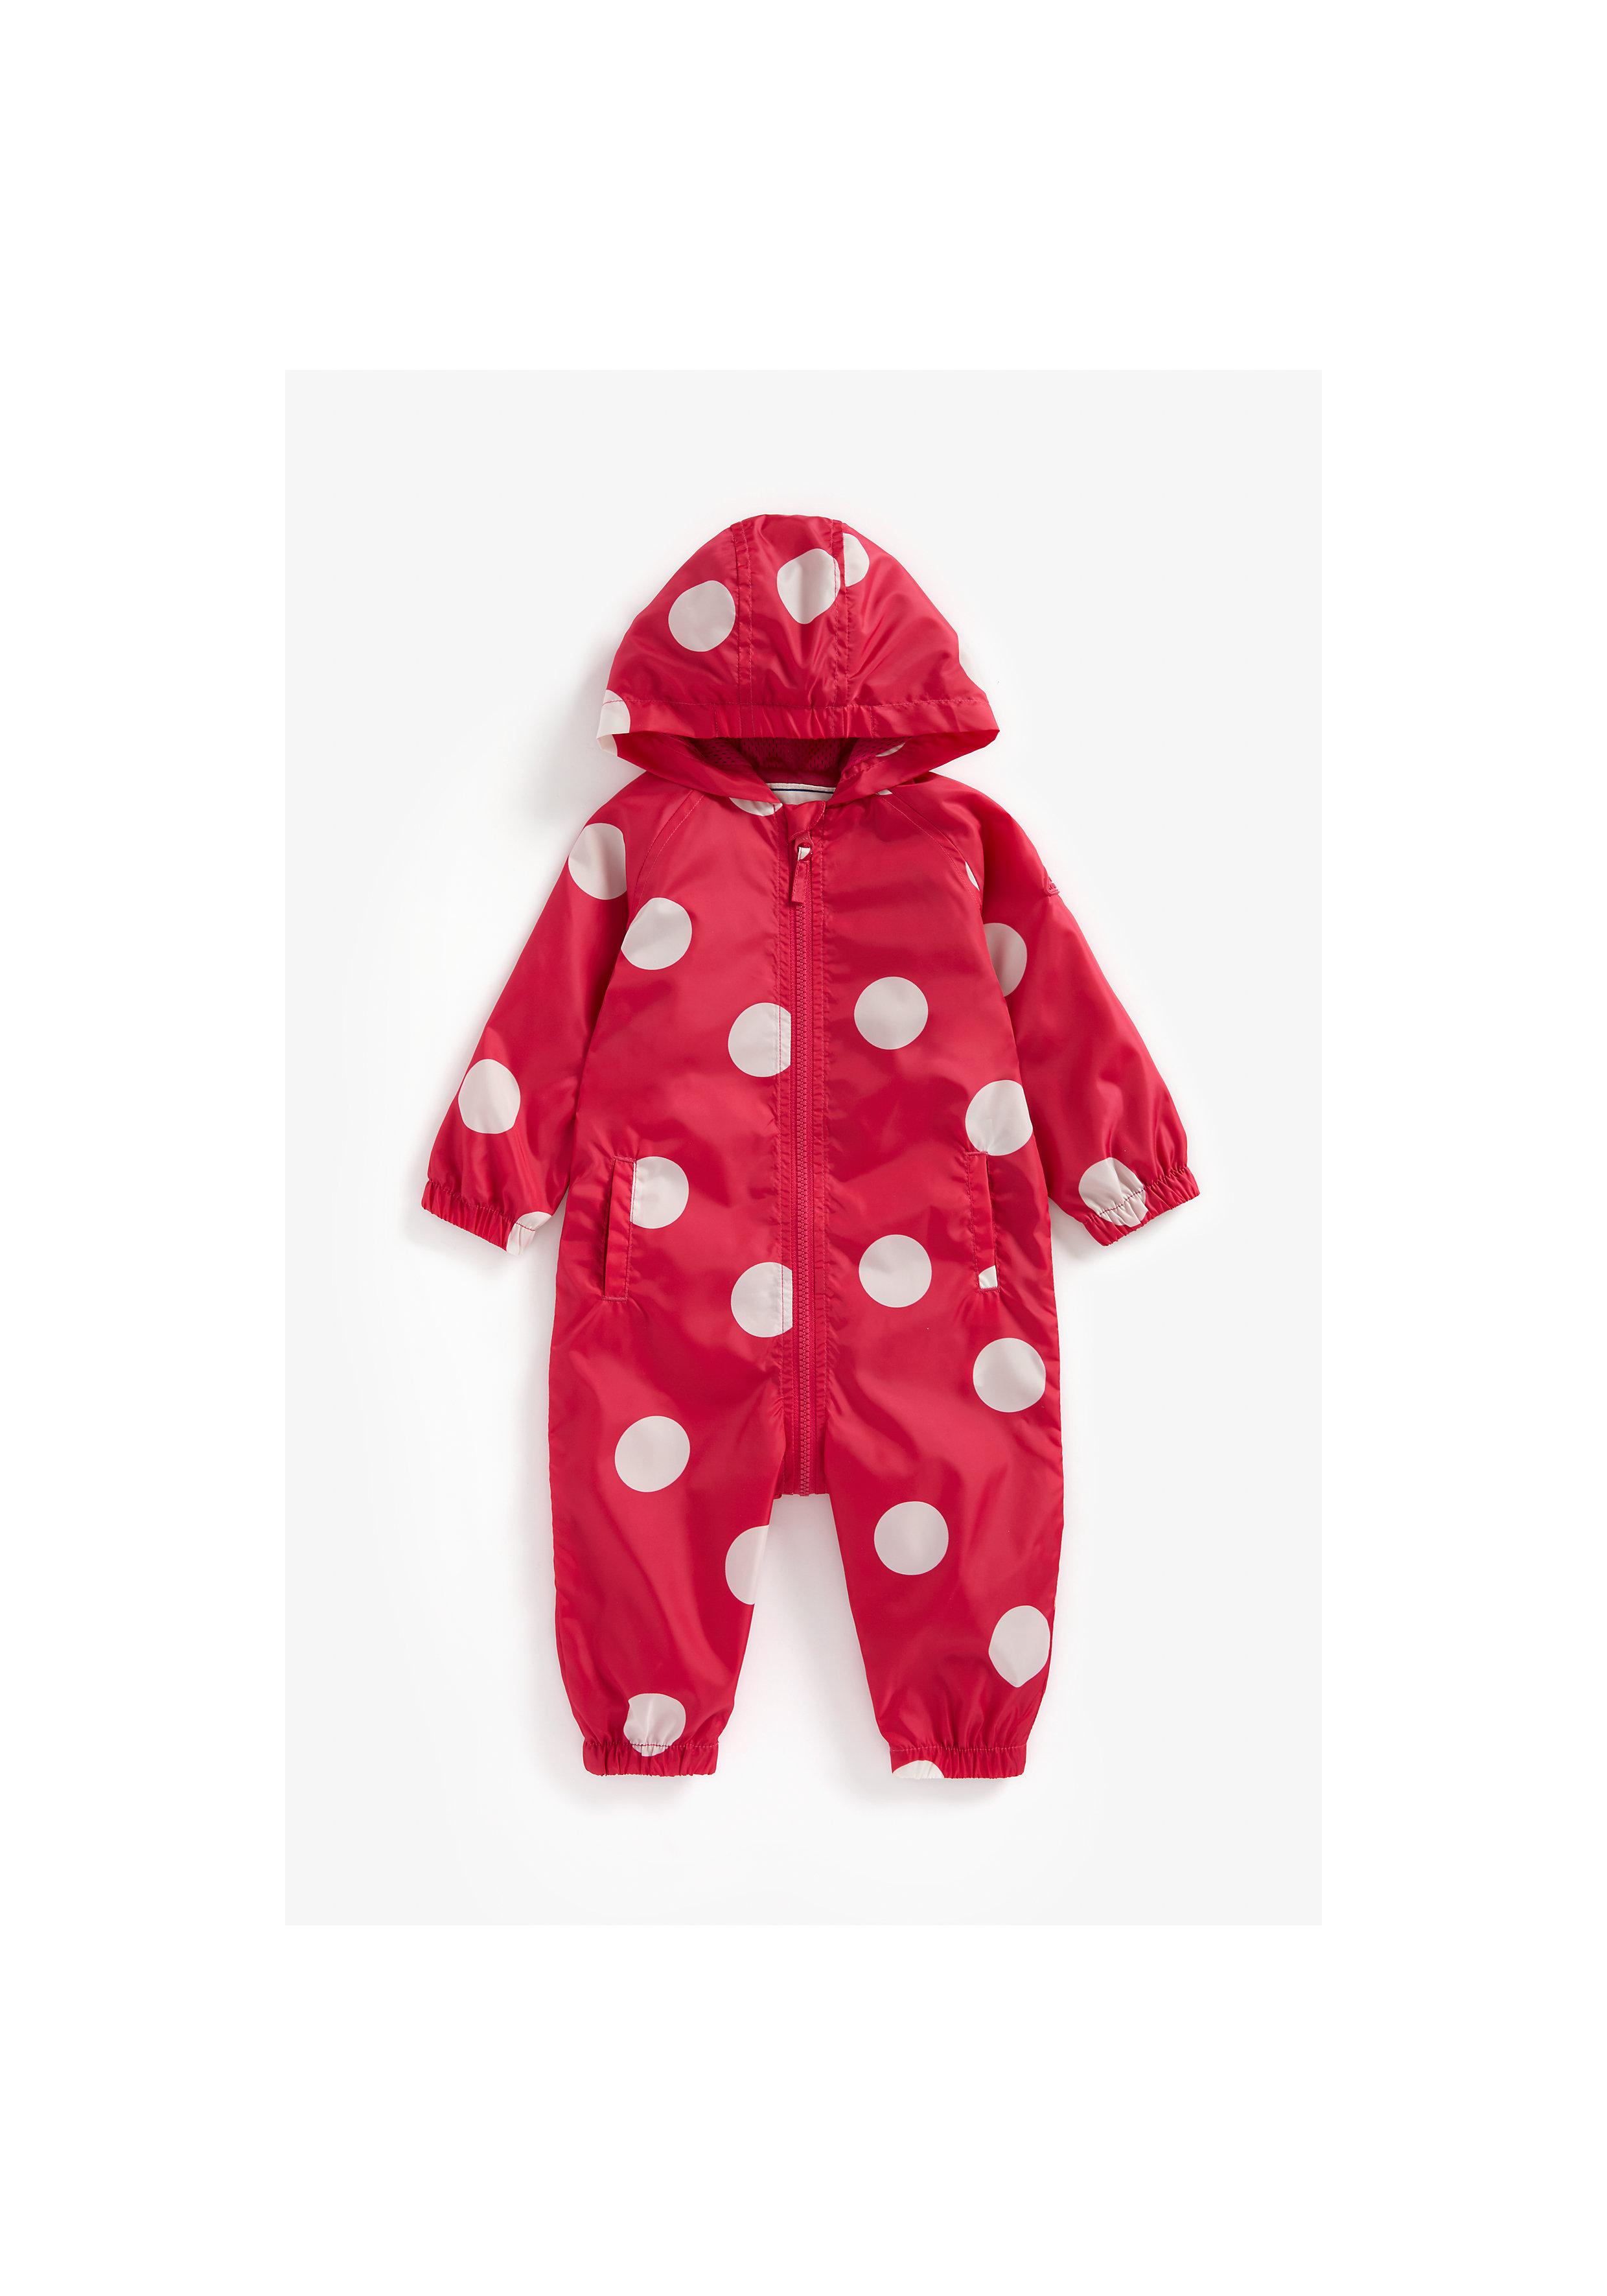 Mothercare | Girls Full Sleeves Hooded Puddlesuit Polka Dot Print - Red